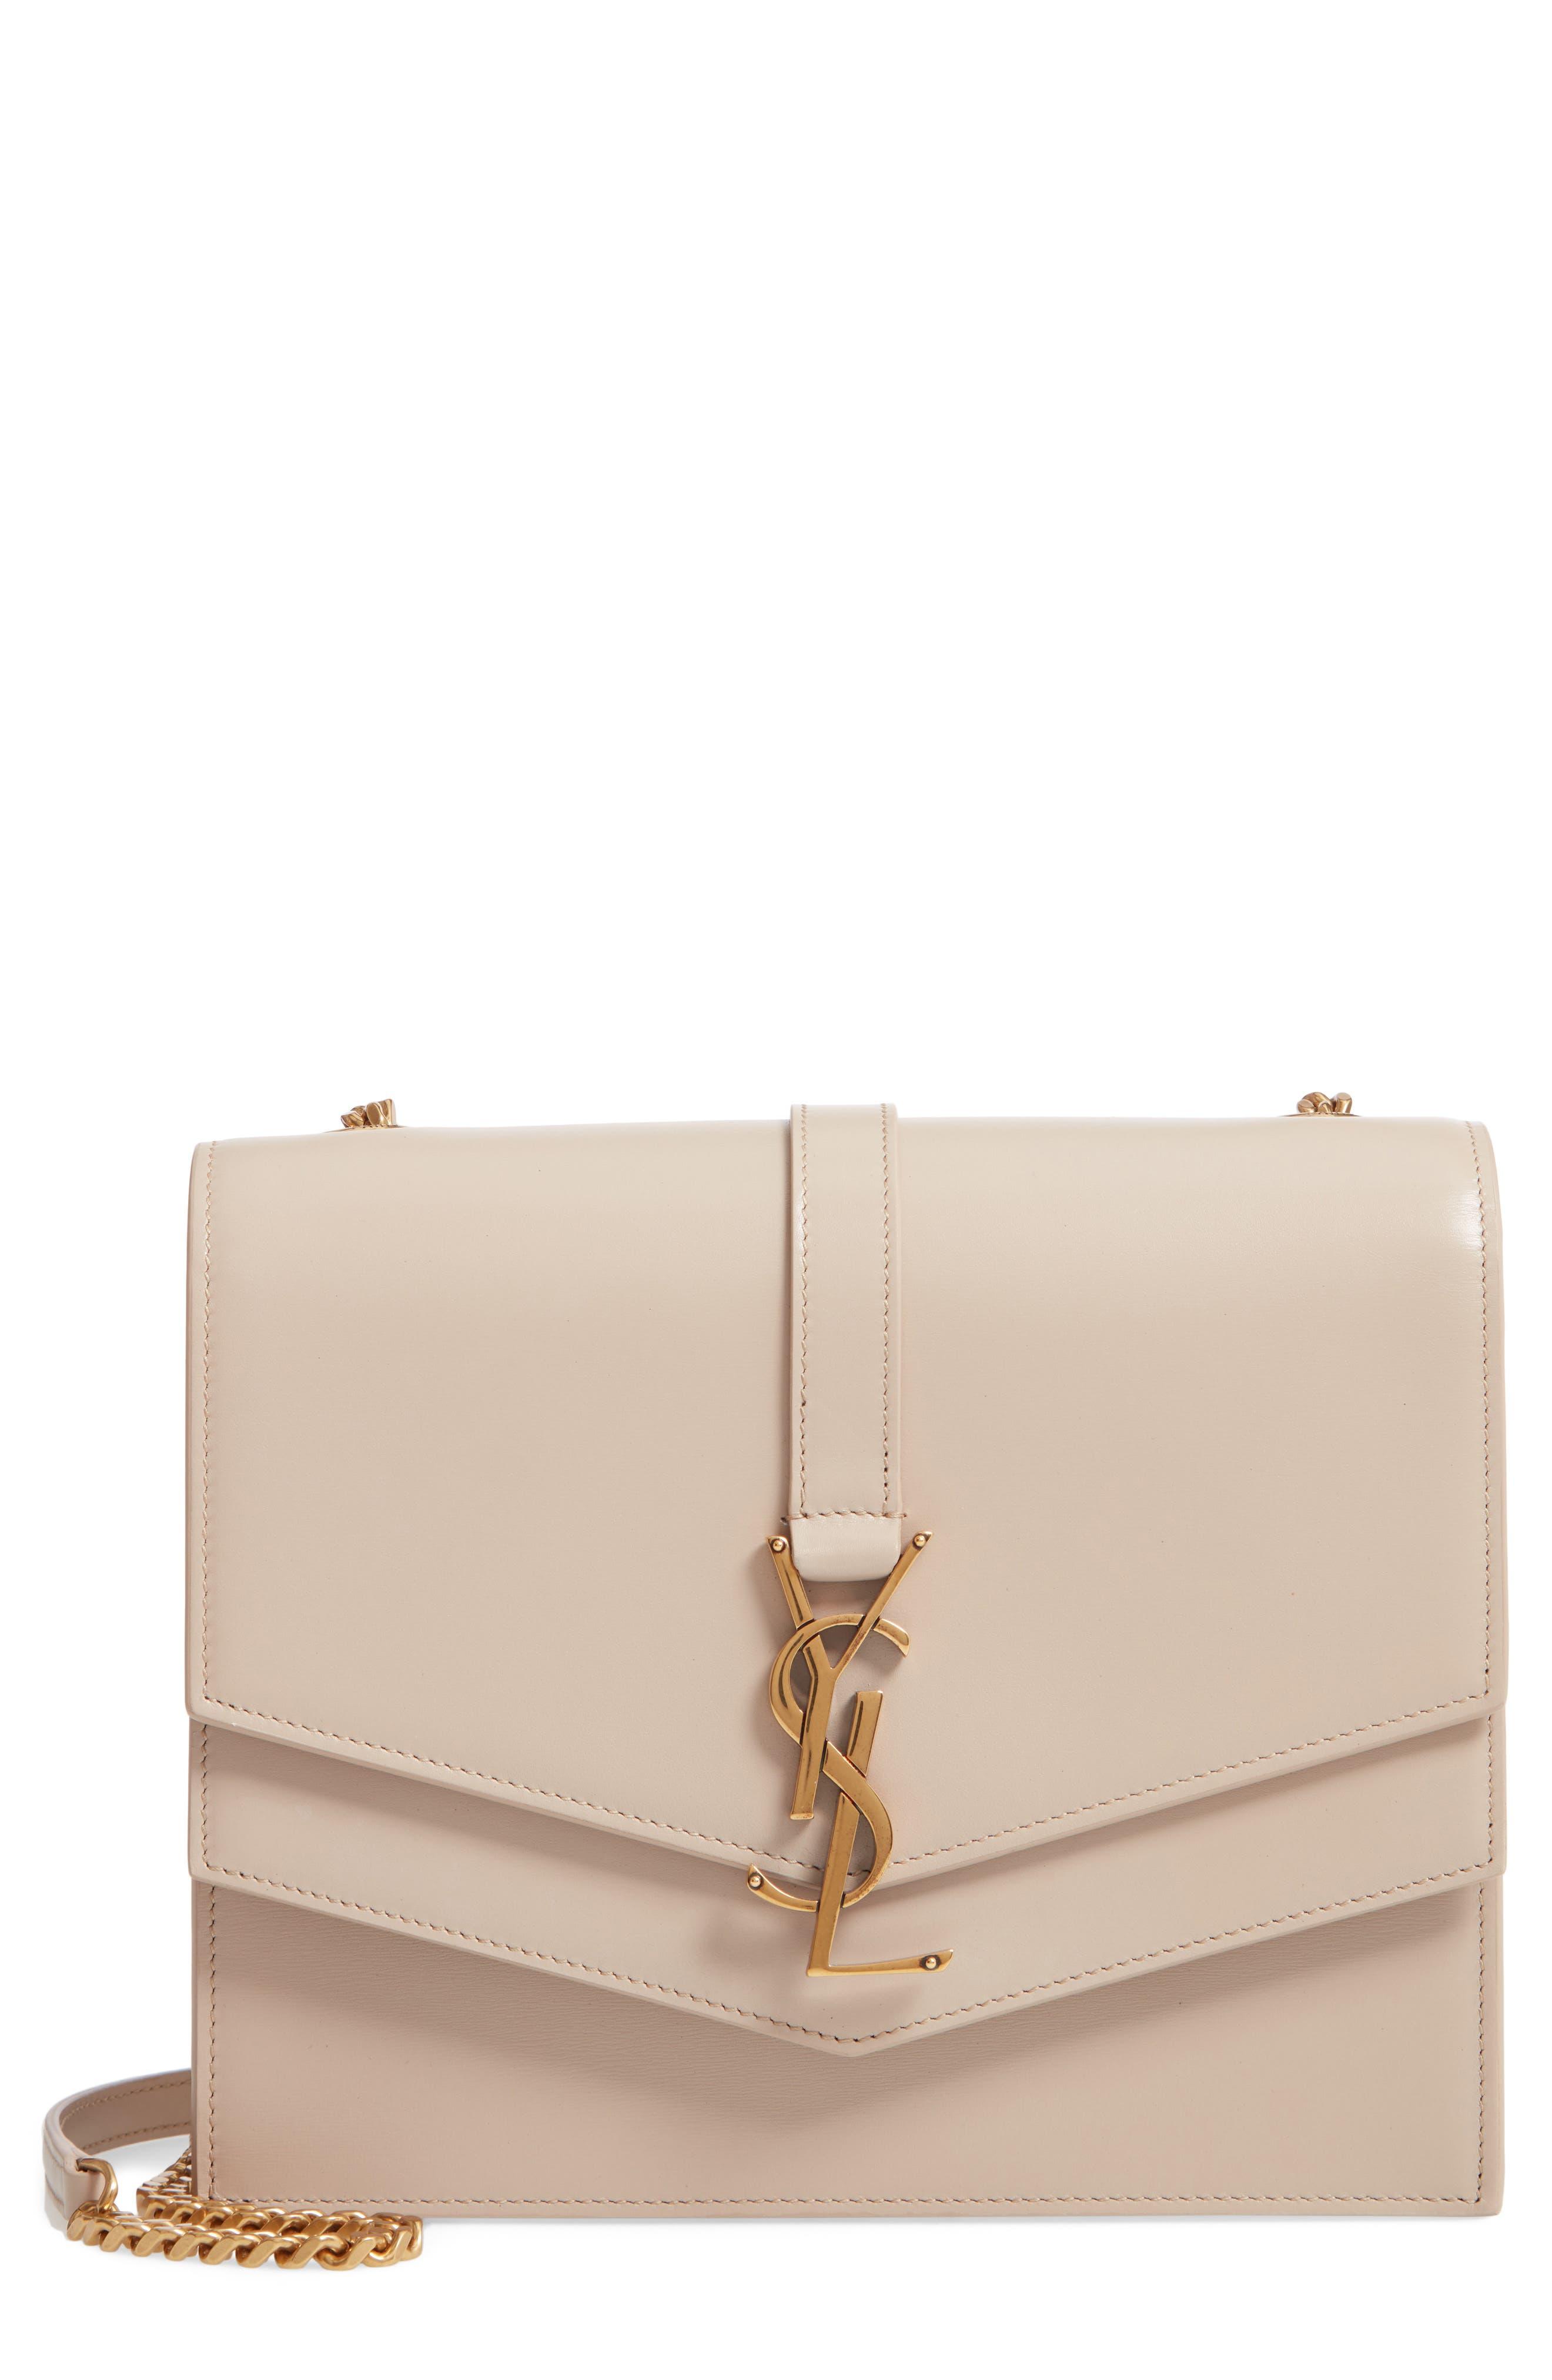 Sulpice Leather Shoulder Bag,                             Main thumbnail 1, color,                             LIGHT NATURAL